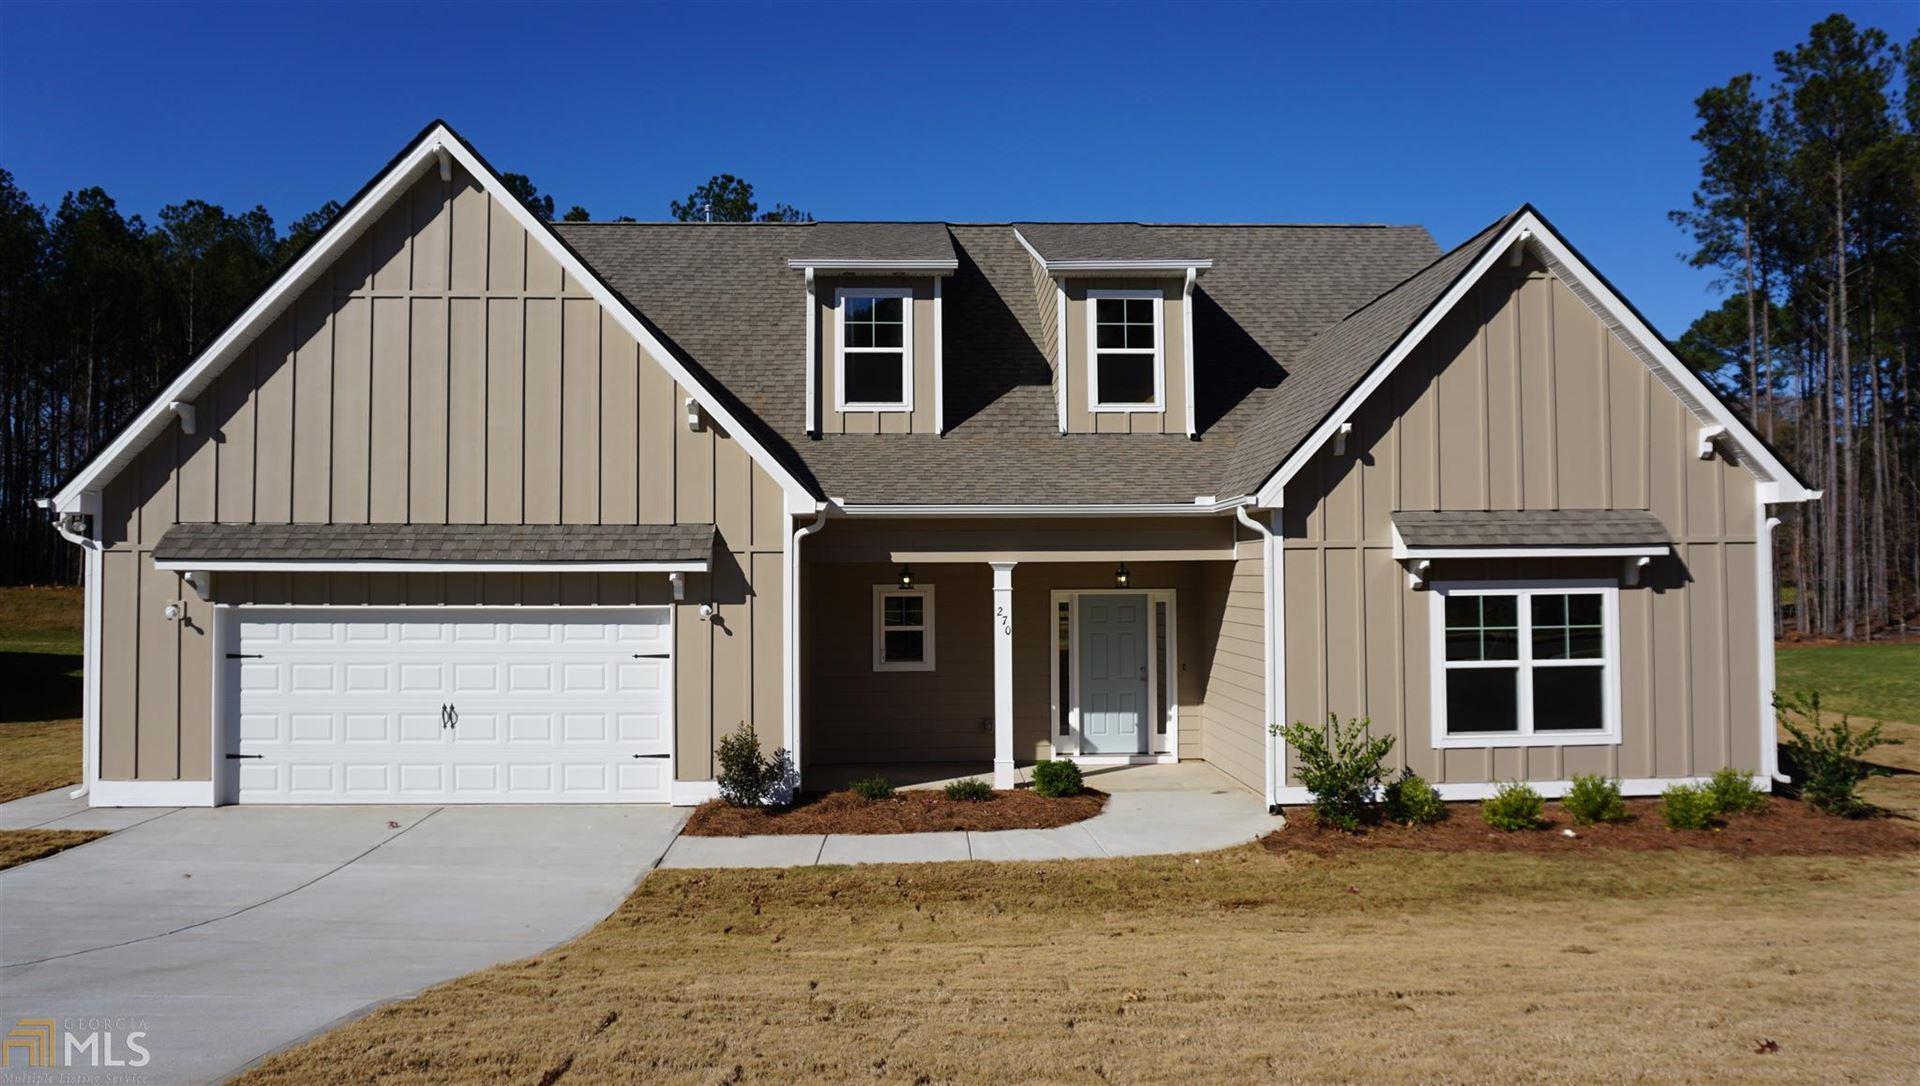 Lot 109 Fieldstone, Senoia, GA 30276 - MLS#: 8821037